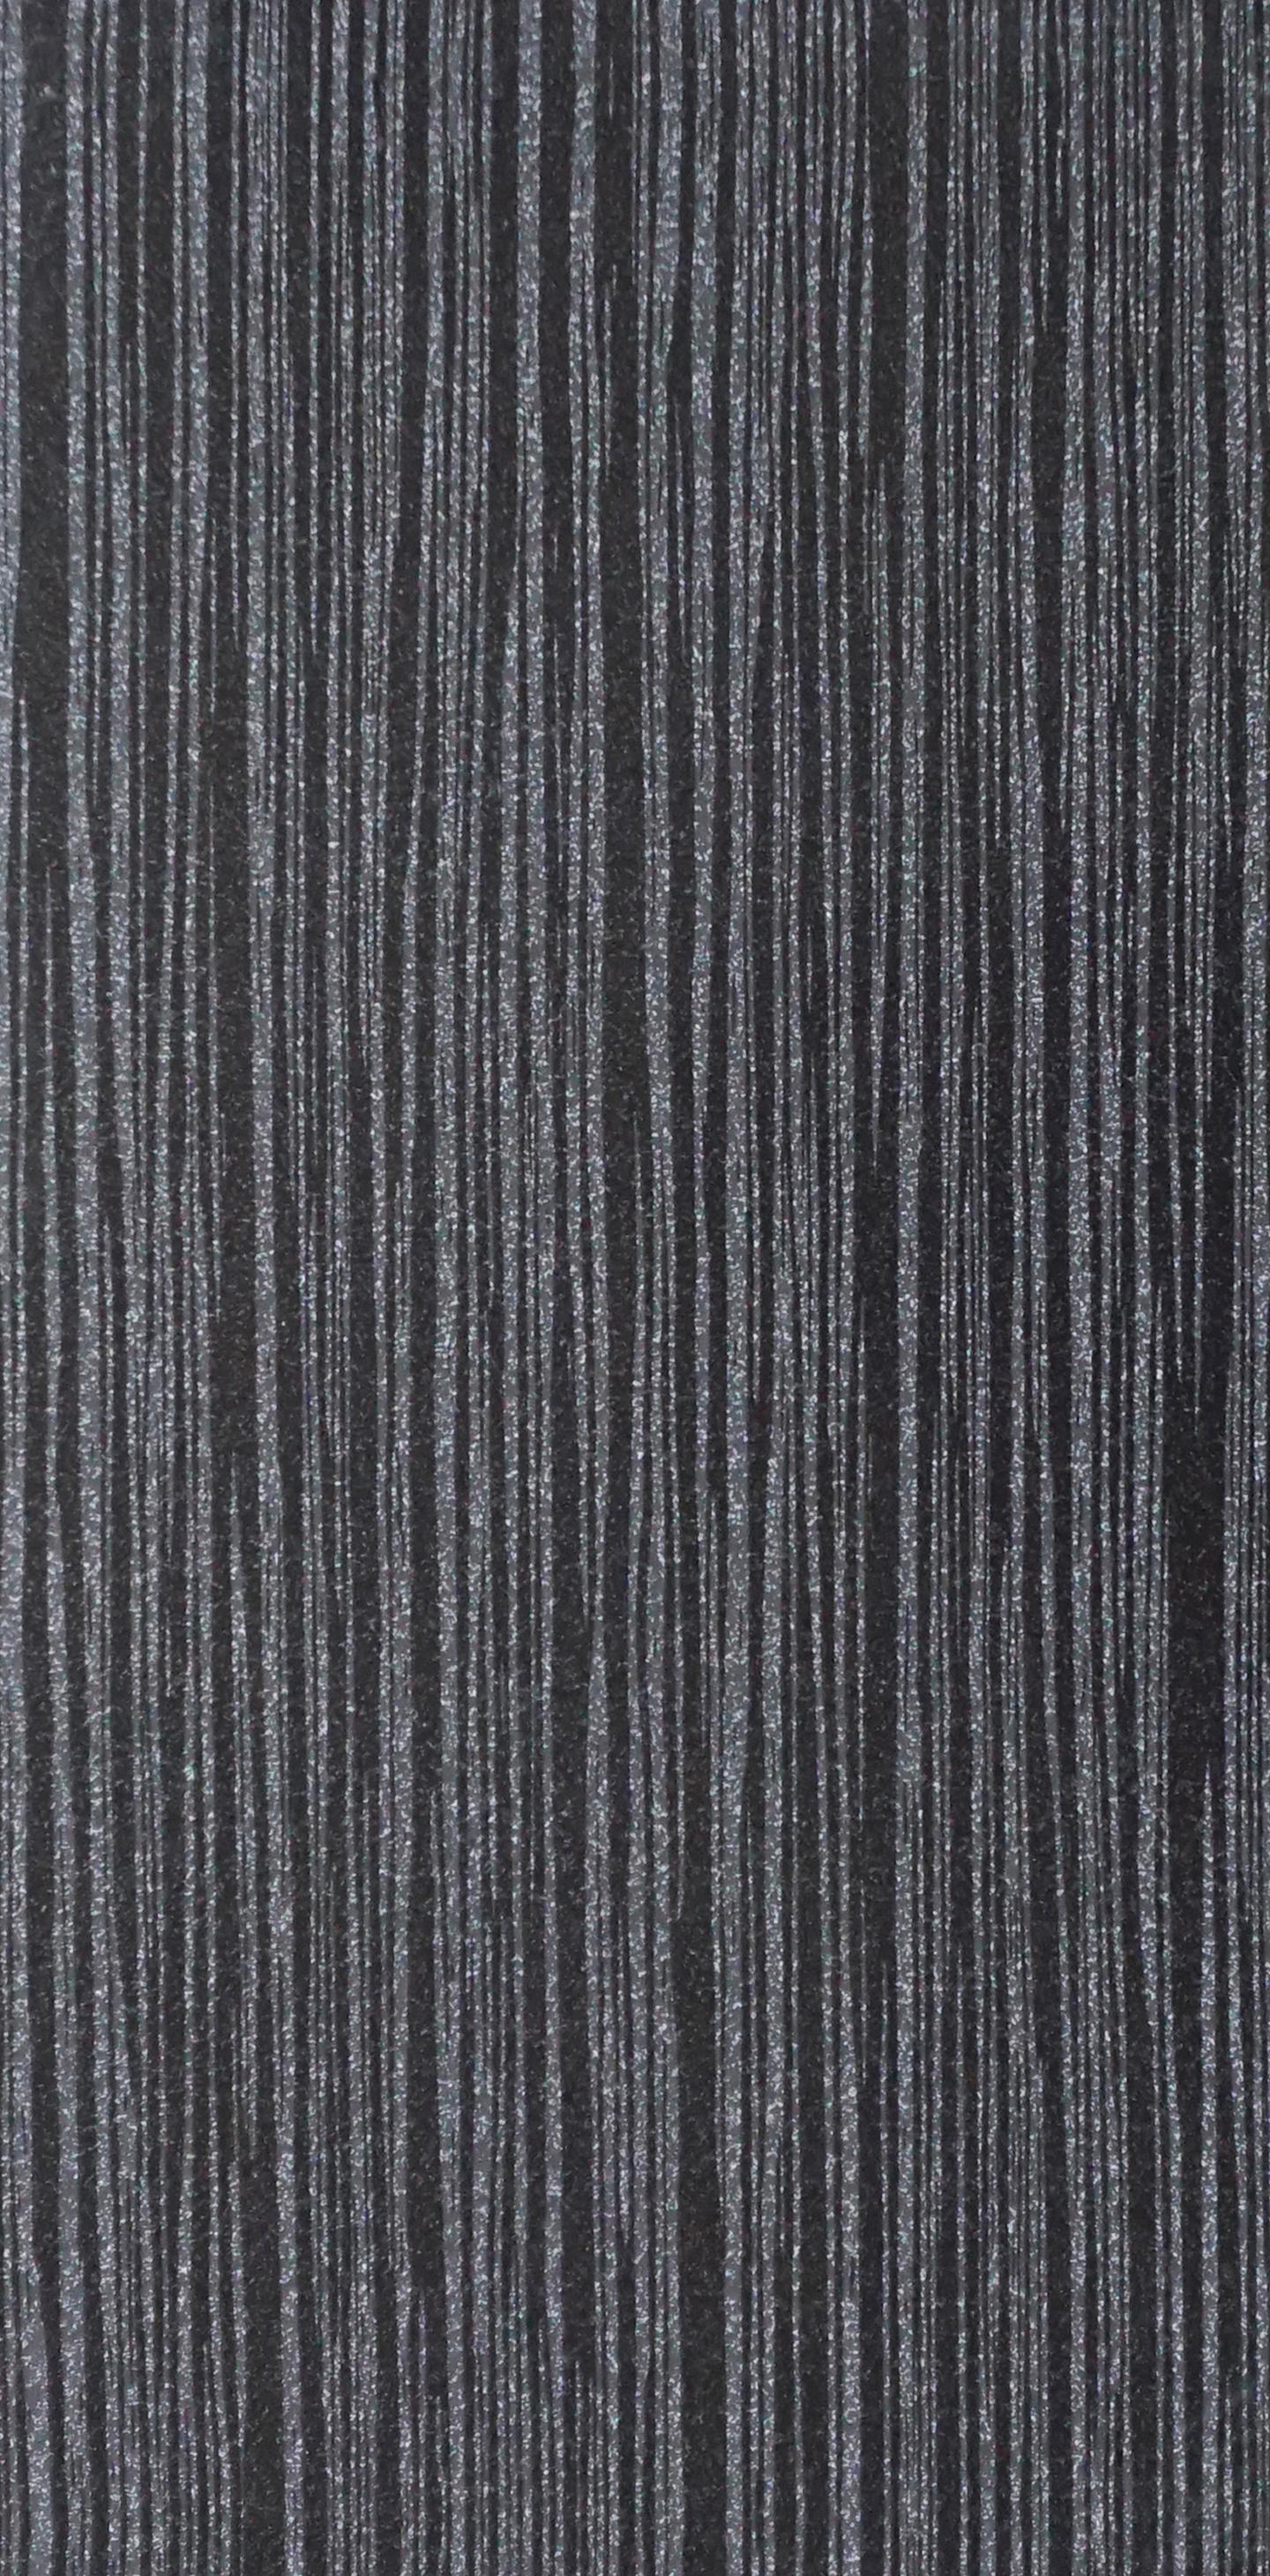 "CASCADE BLACK 12""X24"" -GLAZED PORCELAIN   8 PC/CTN (1  5.5 SF);  40 CTN/PLT"